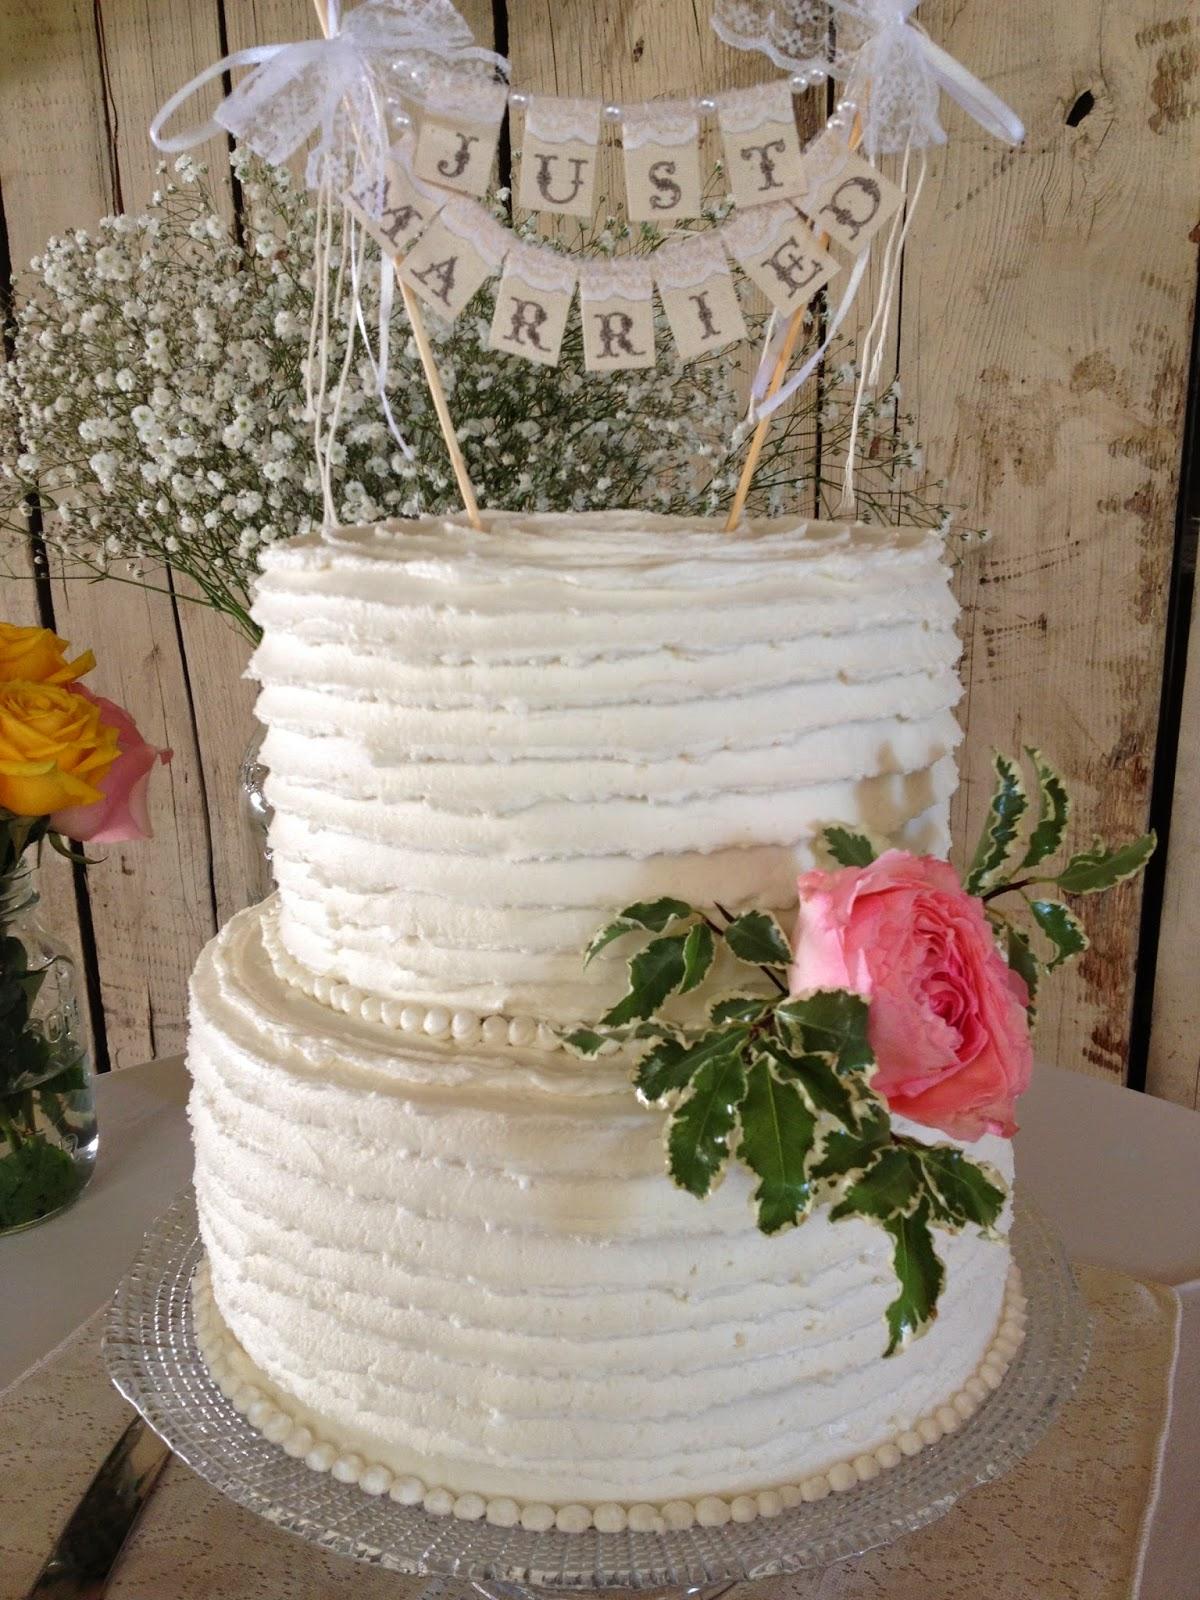 Sugar Love Cake Design Rustic Wedding and Cupcakes